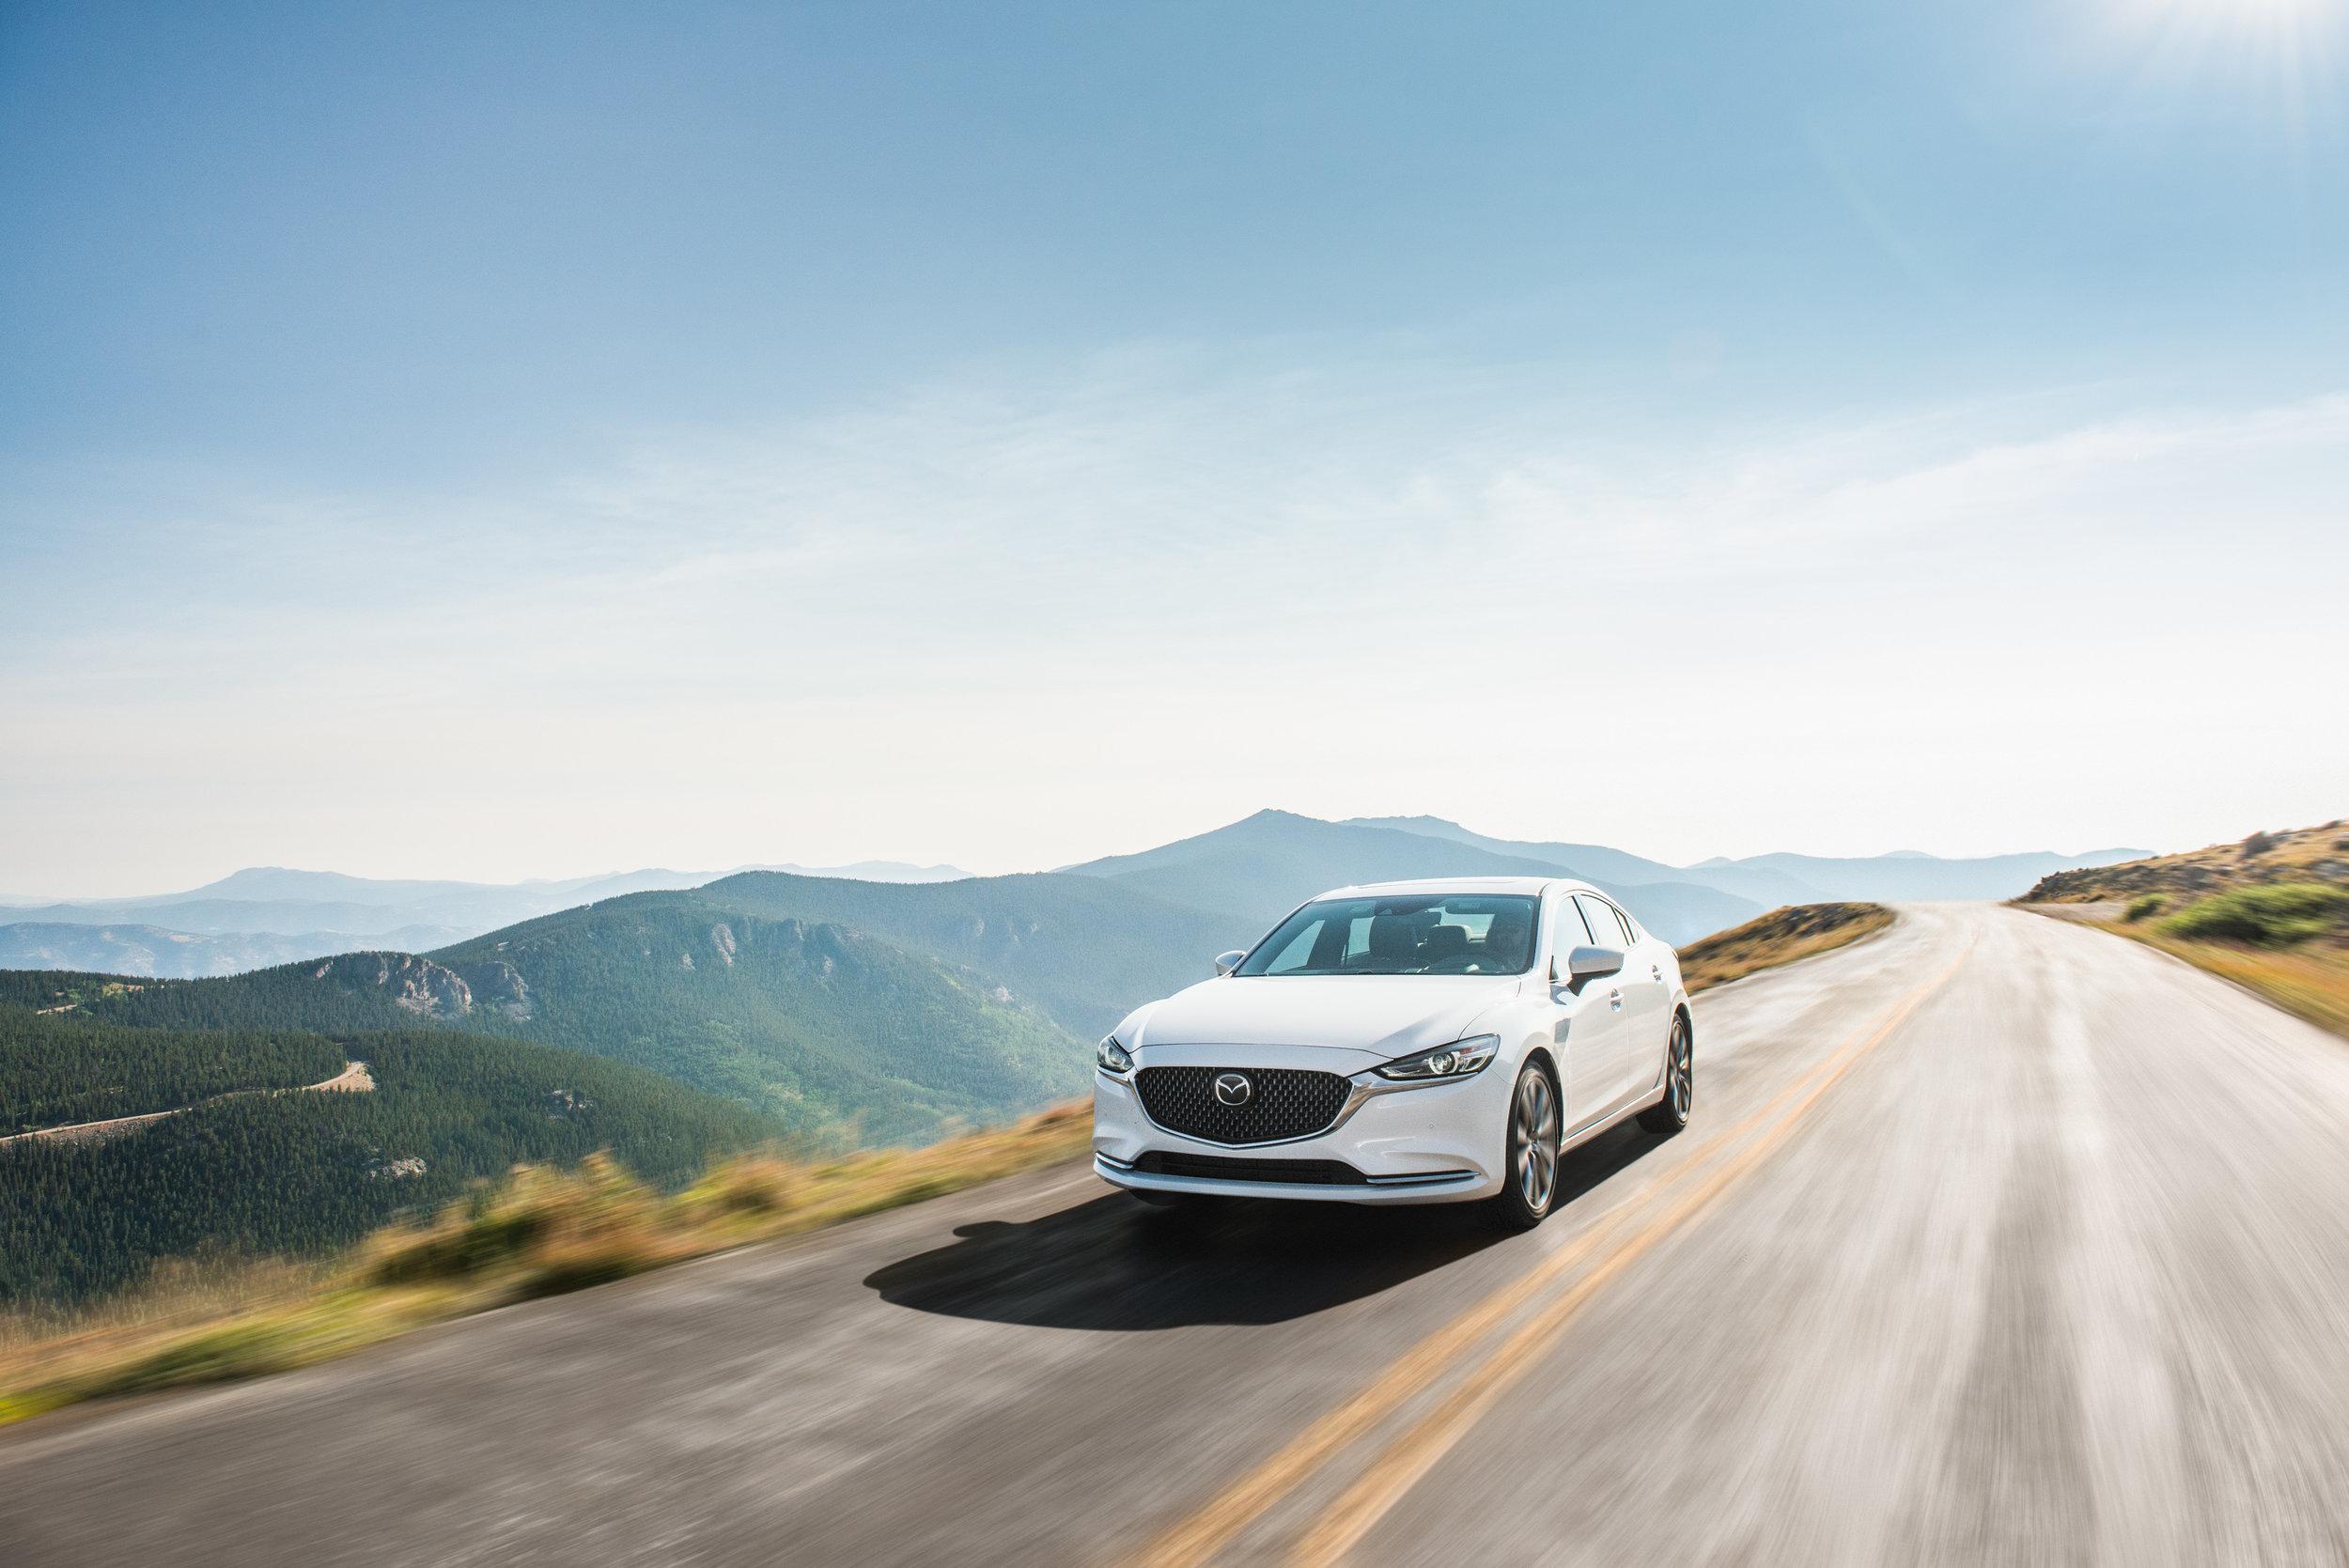 Mazda 6 Denver Automotive Photography